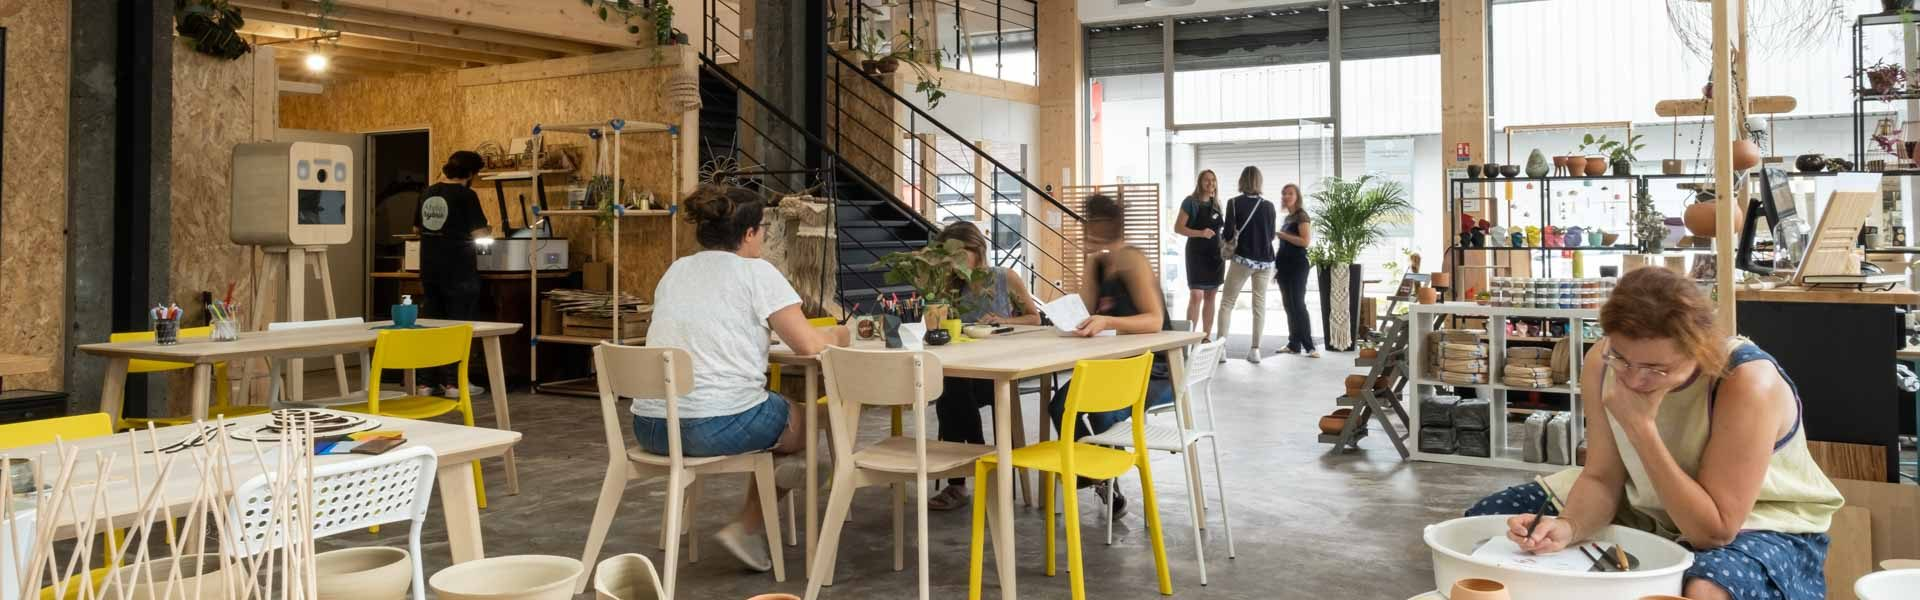 Ateliers Hybride, Tiers-lieu créatif à Pau